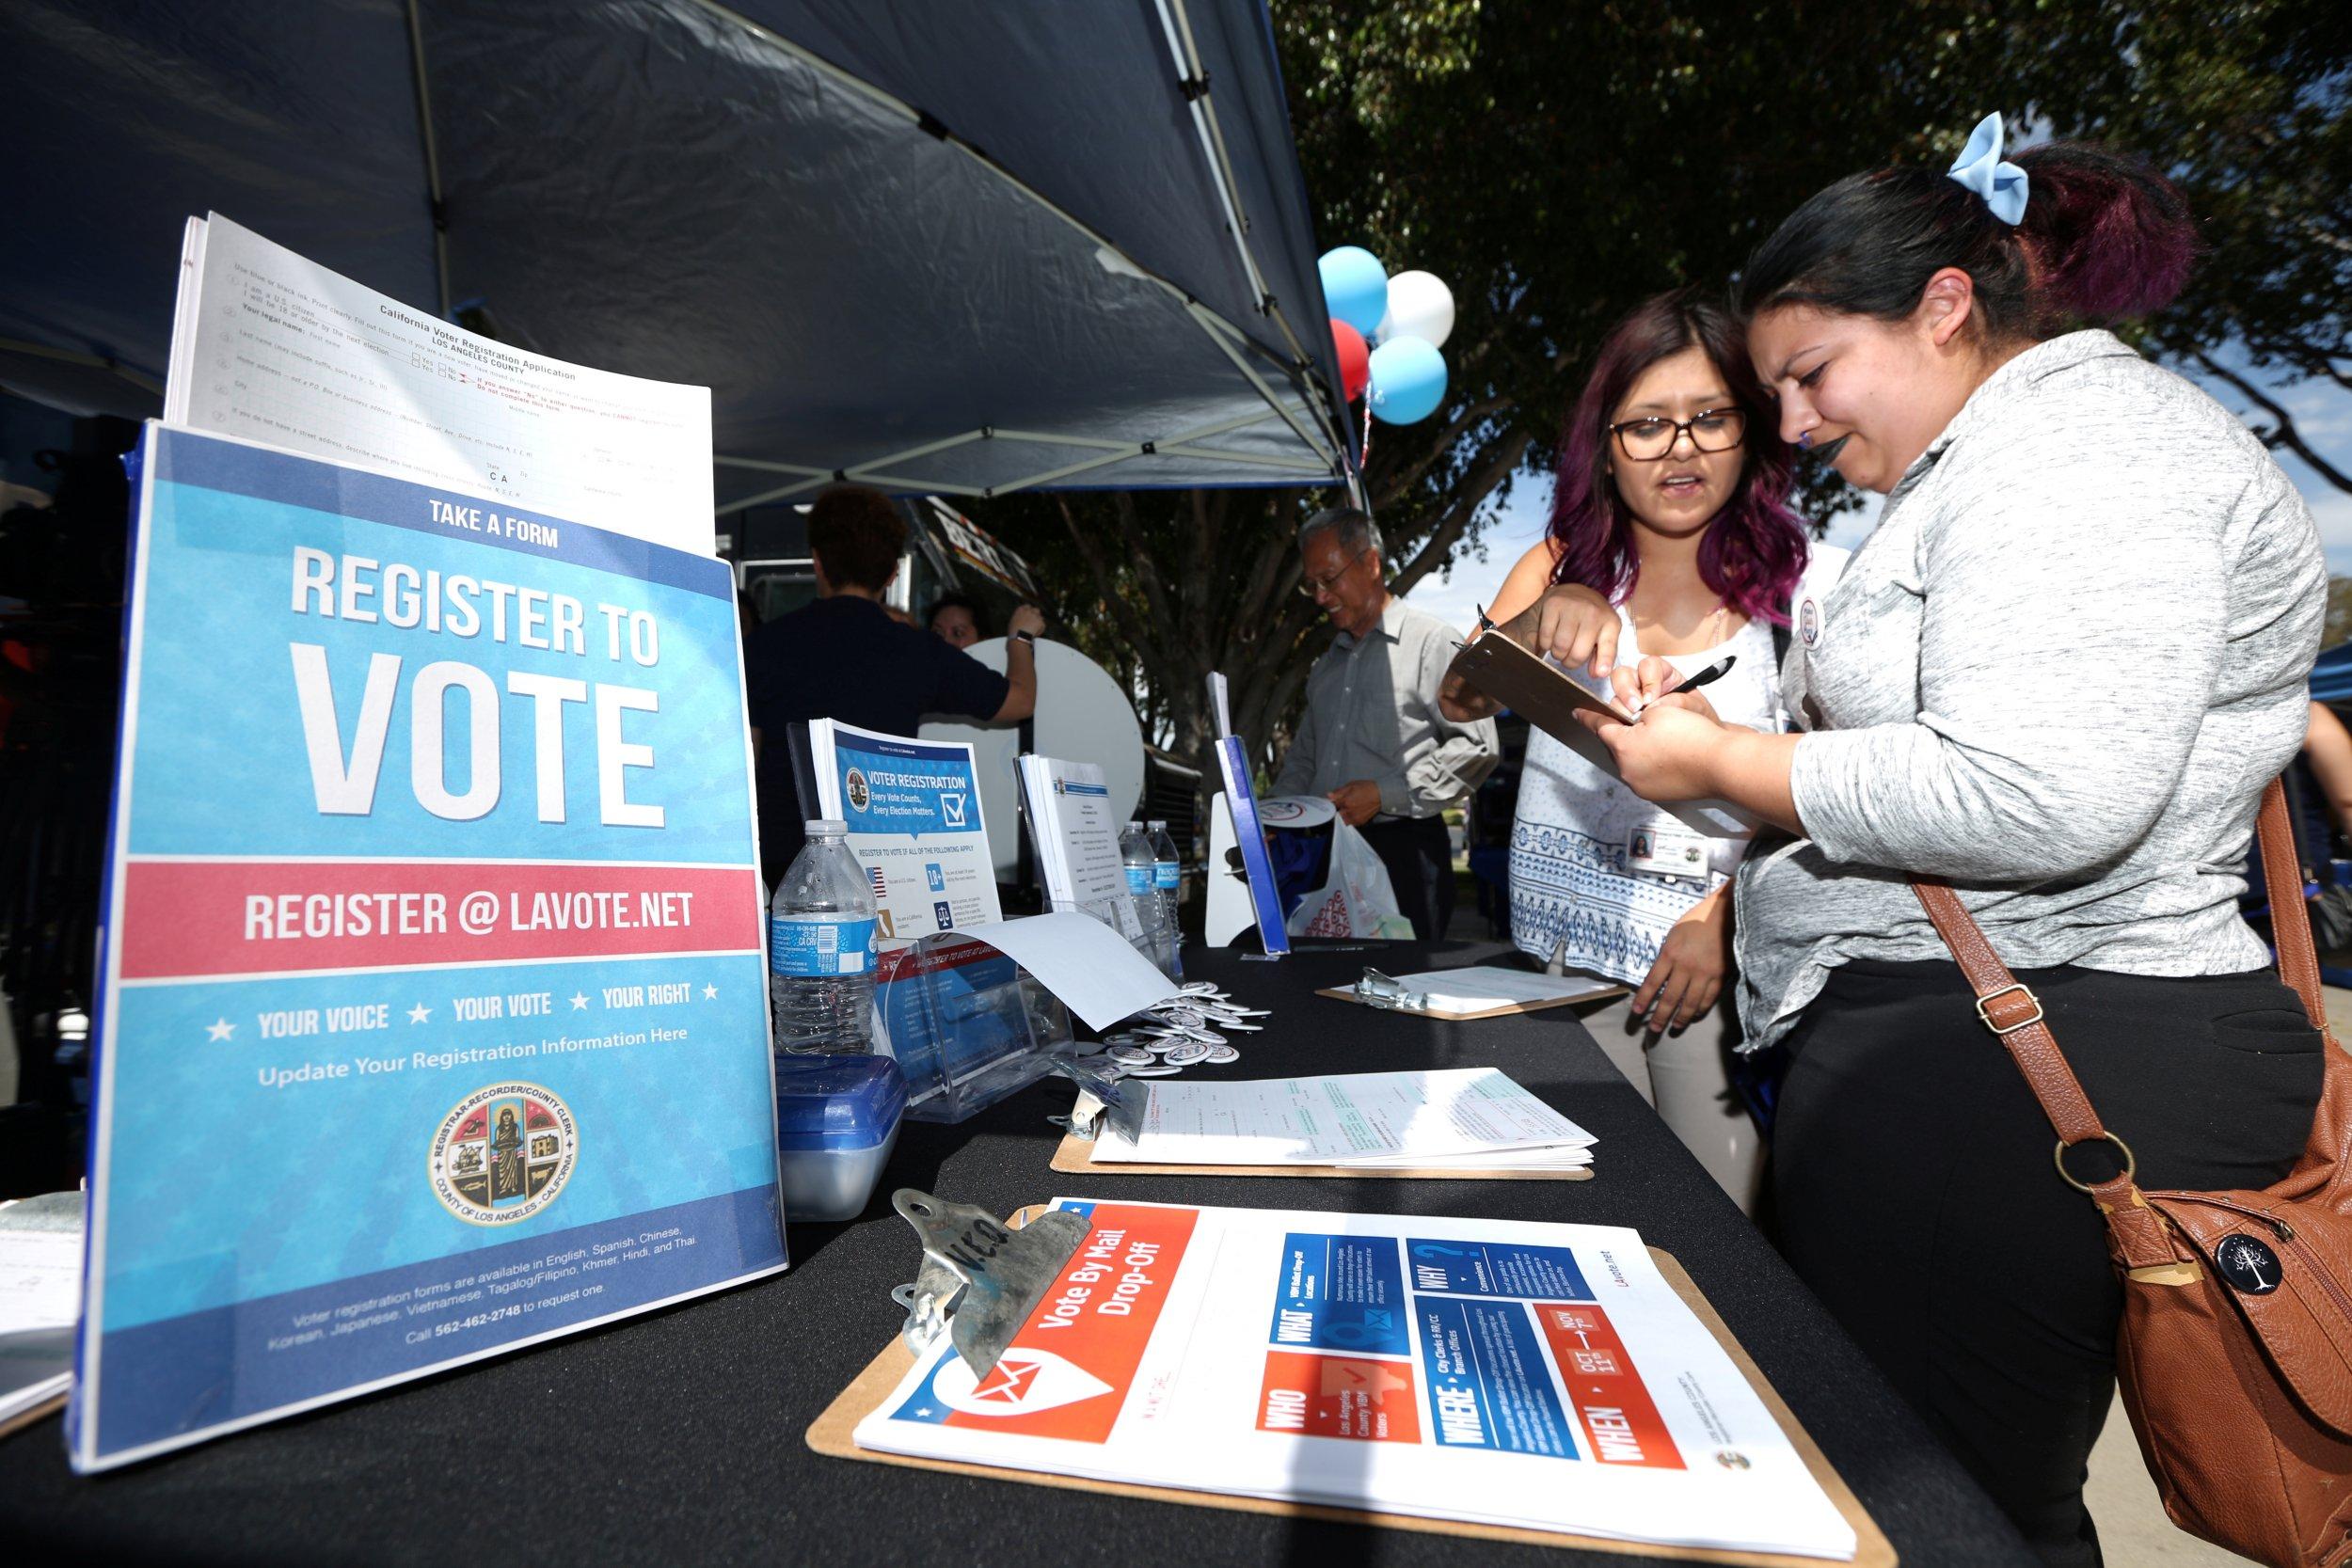 National Voter Registration Day >> Social Media Sites Are Making Voter Registration Easier Than Ever Before